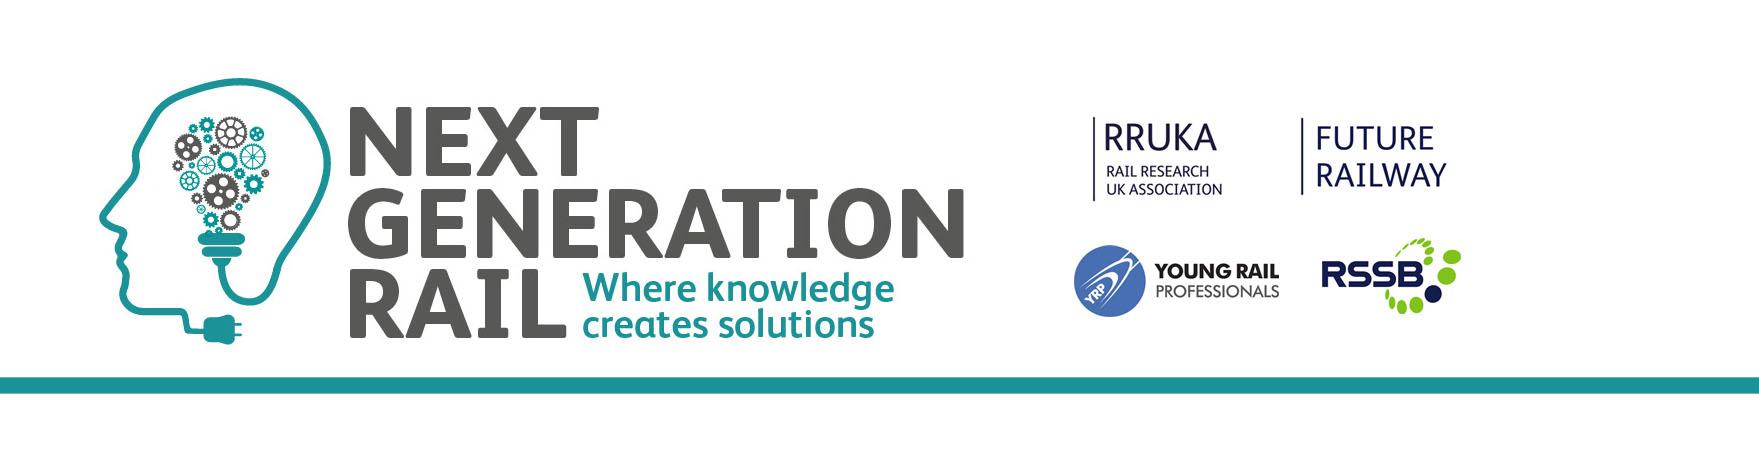 Next Generation Rail 2016: Where knowledge creates solutions